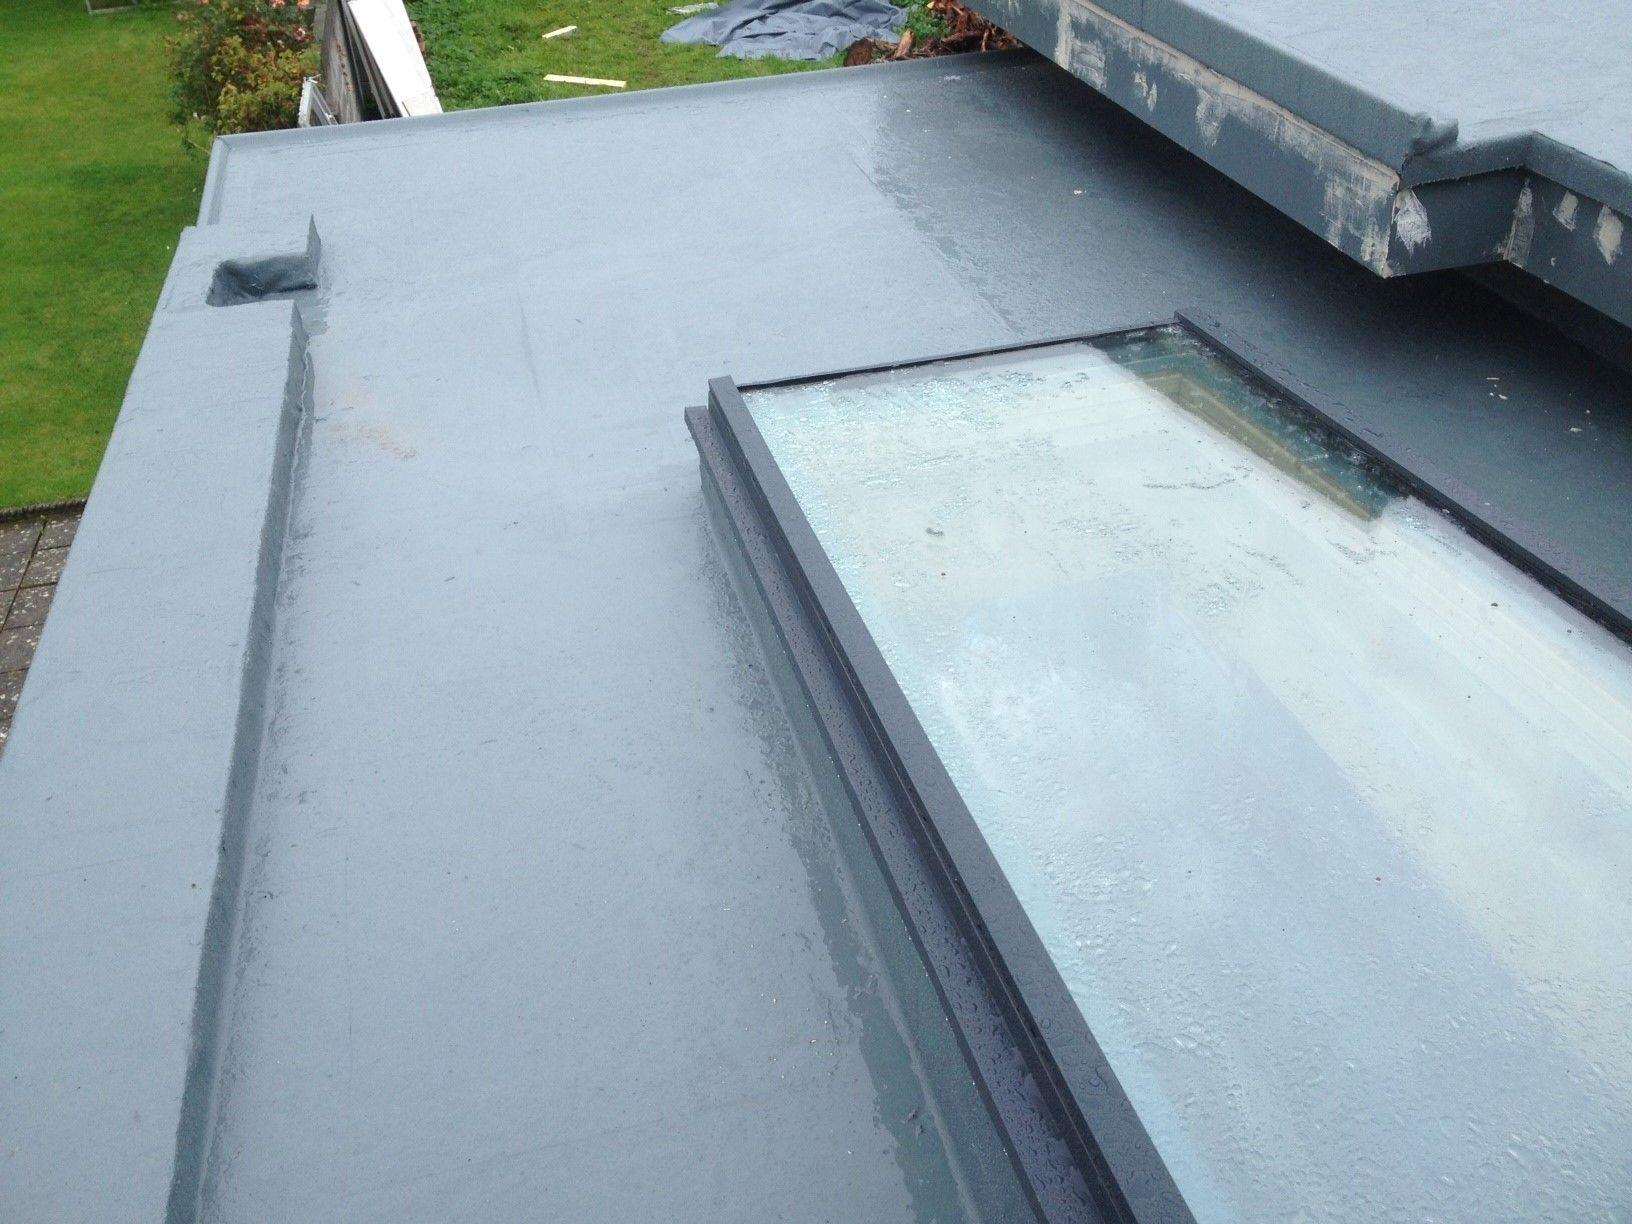 Fibreglass Flat Roof Dublin Fibreglass Roof Flat Roof Fibreglass Flat Roof